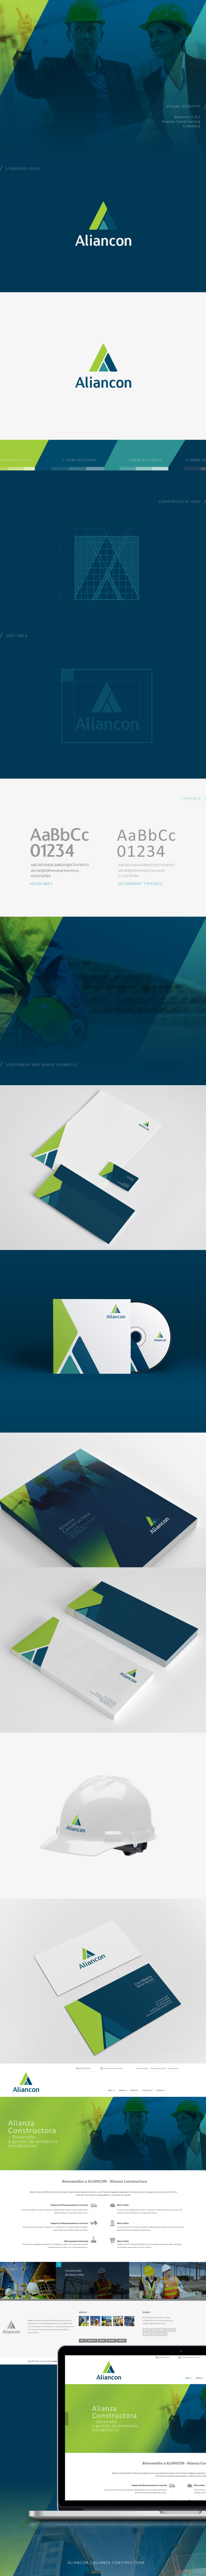 brand,logo,Logotype,construction,building,diego,caceres,claudia,rueda,oven,design,identity,Bucaramanga,colombia,Stationery